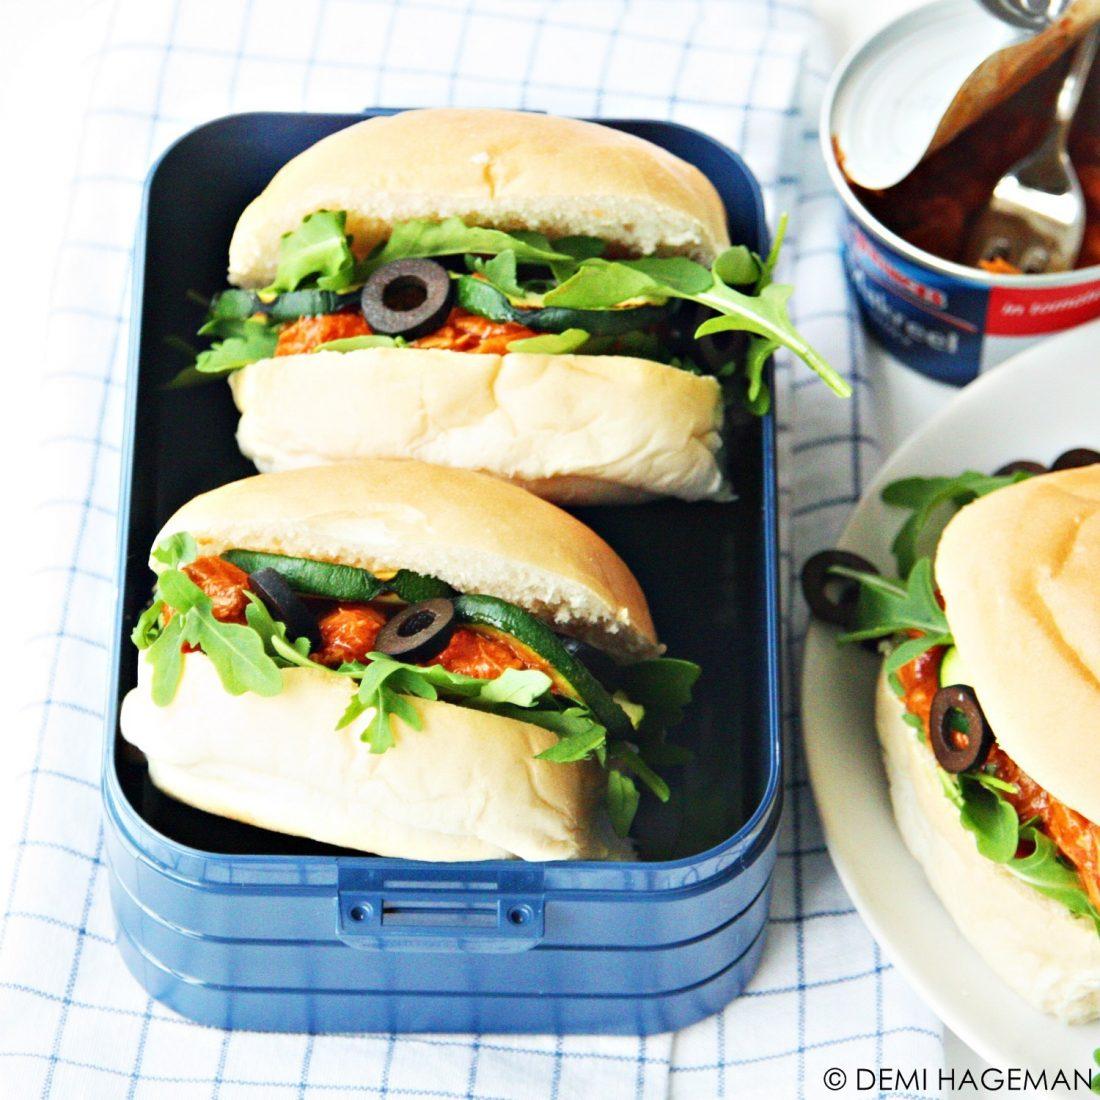 picknickbroodjes met makreel in tomatensaus, gegegrilde courgette en olijven. StudioKOOK.nl Demi Hageman. Princes Foods.